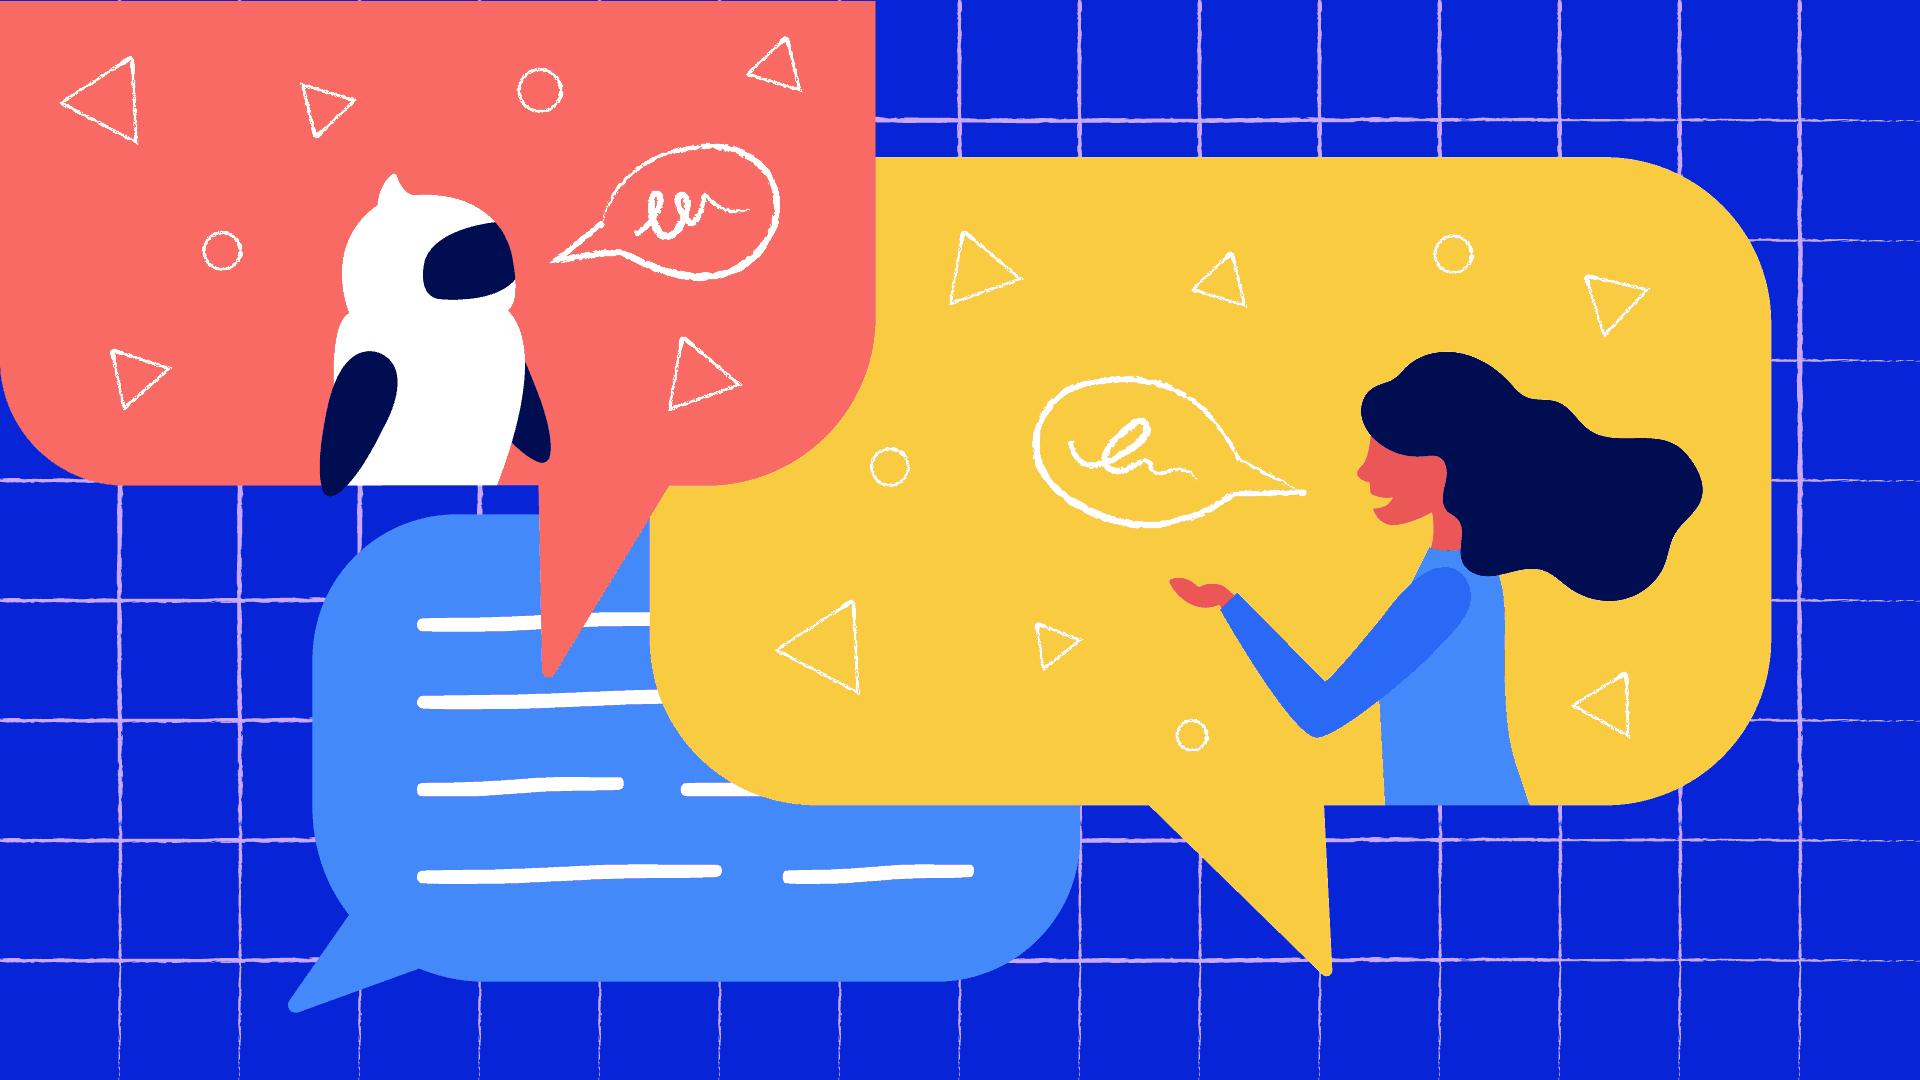 Convensional AI